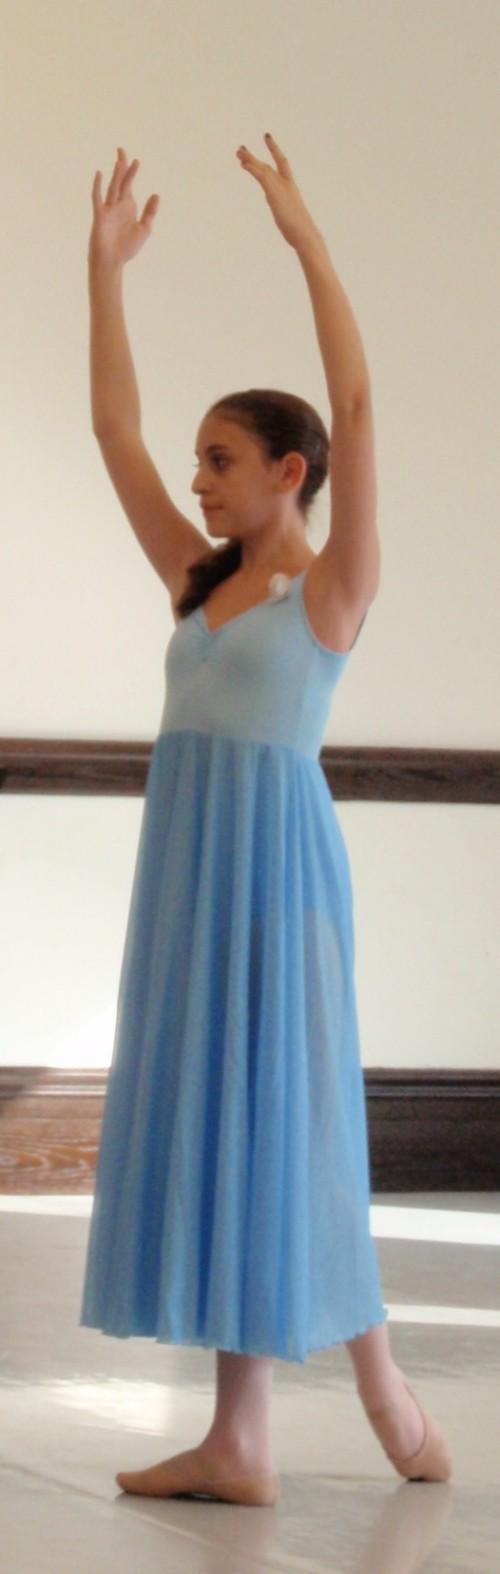 Dancing Kyla